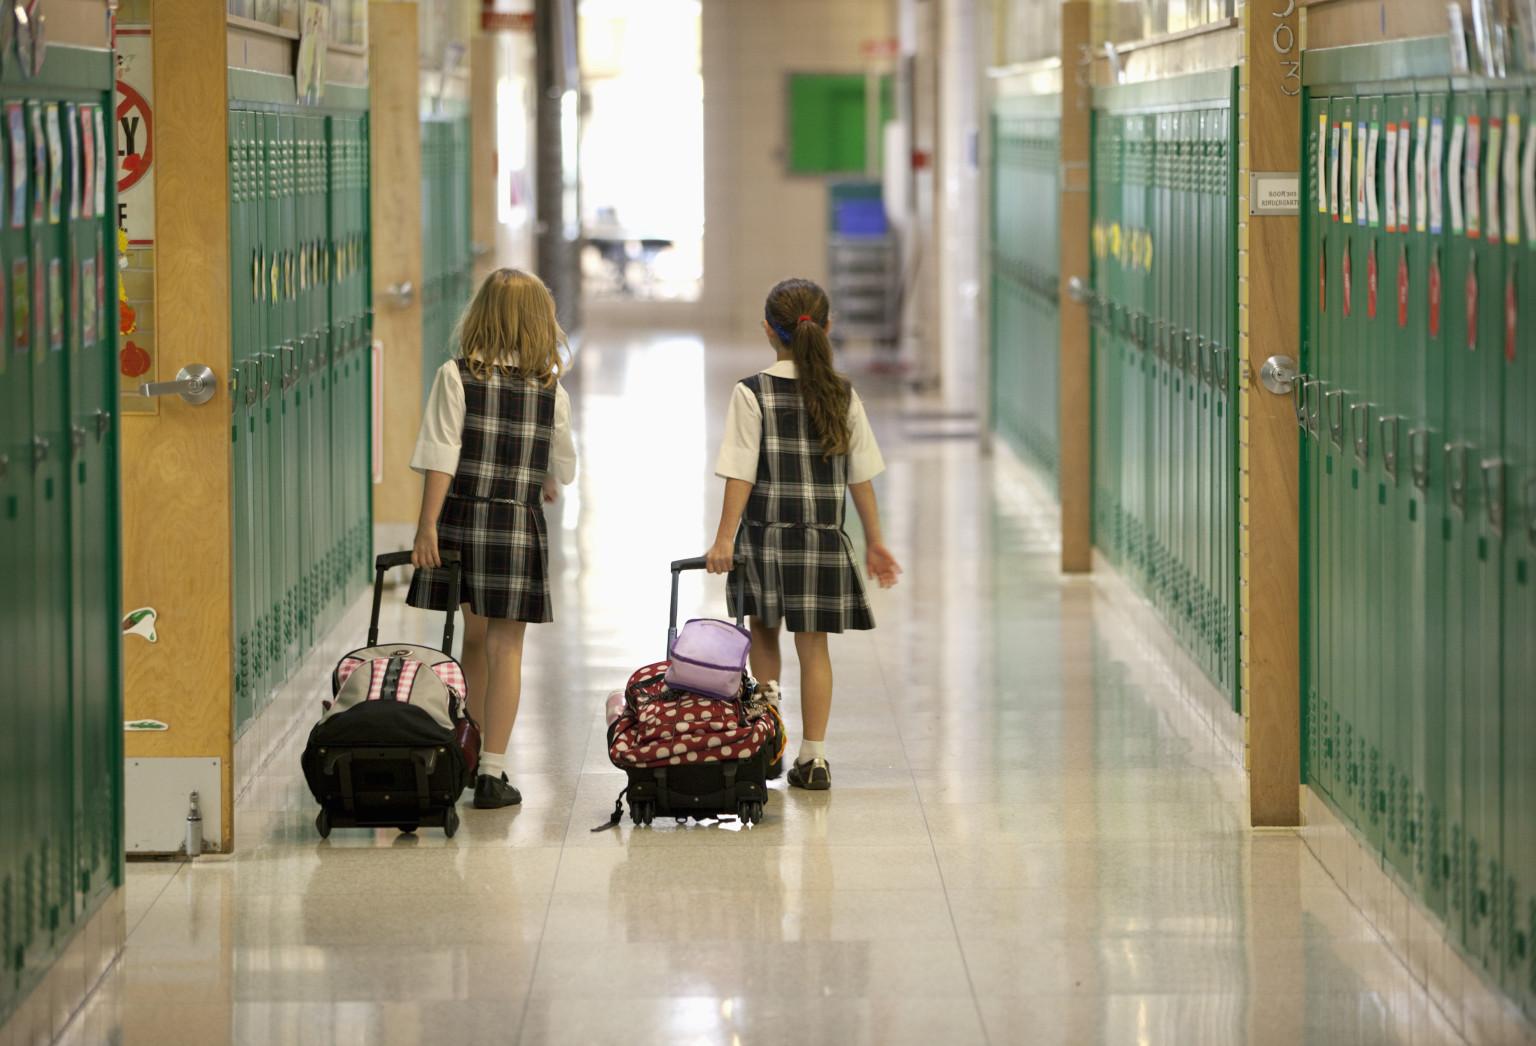 is charter school colocation tearing public schools apart